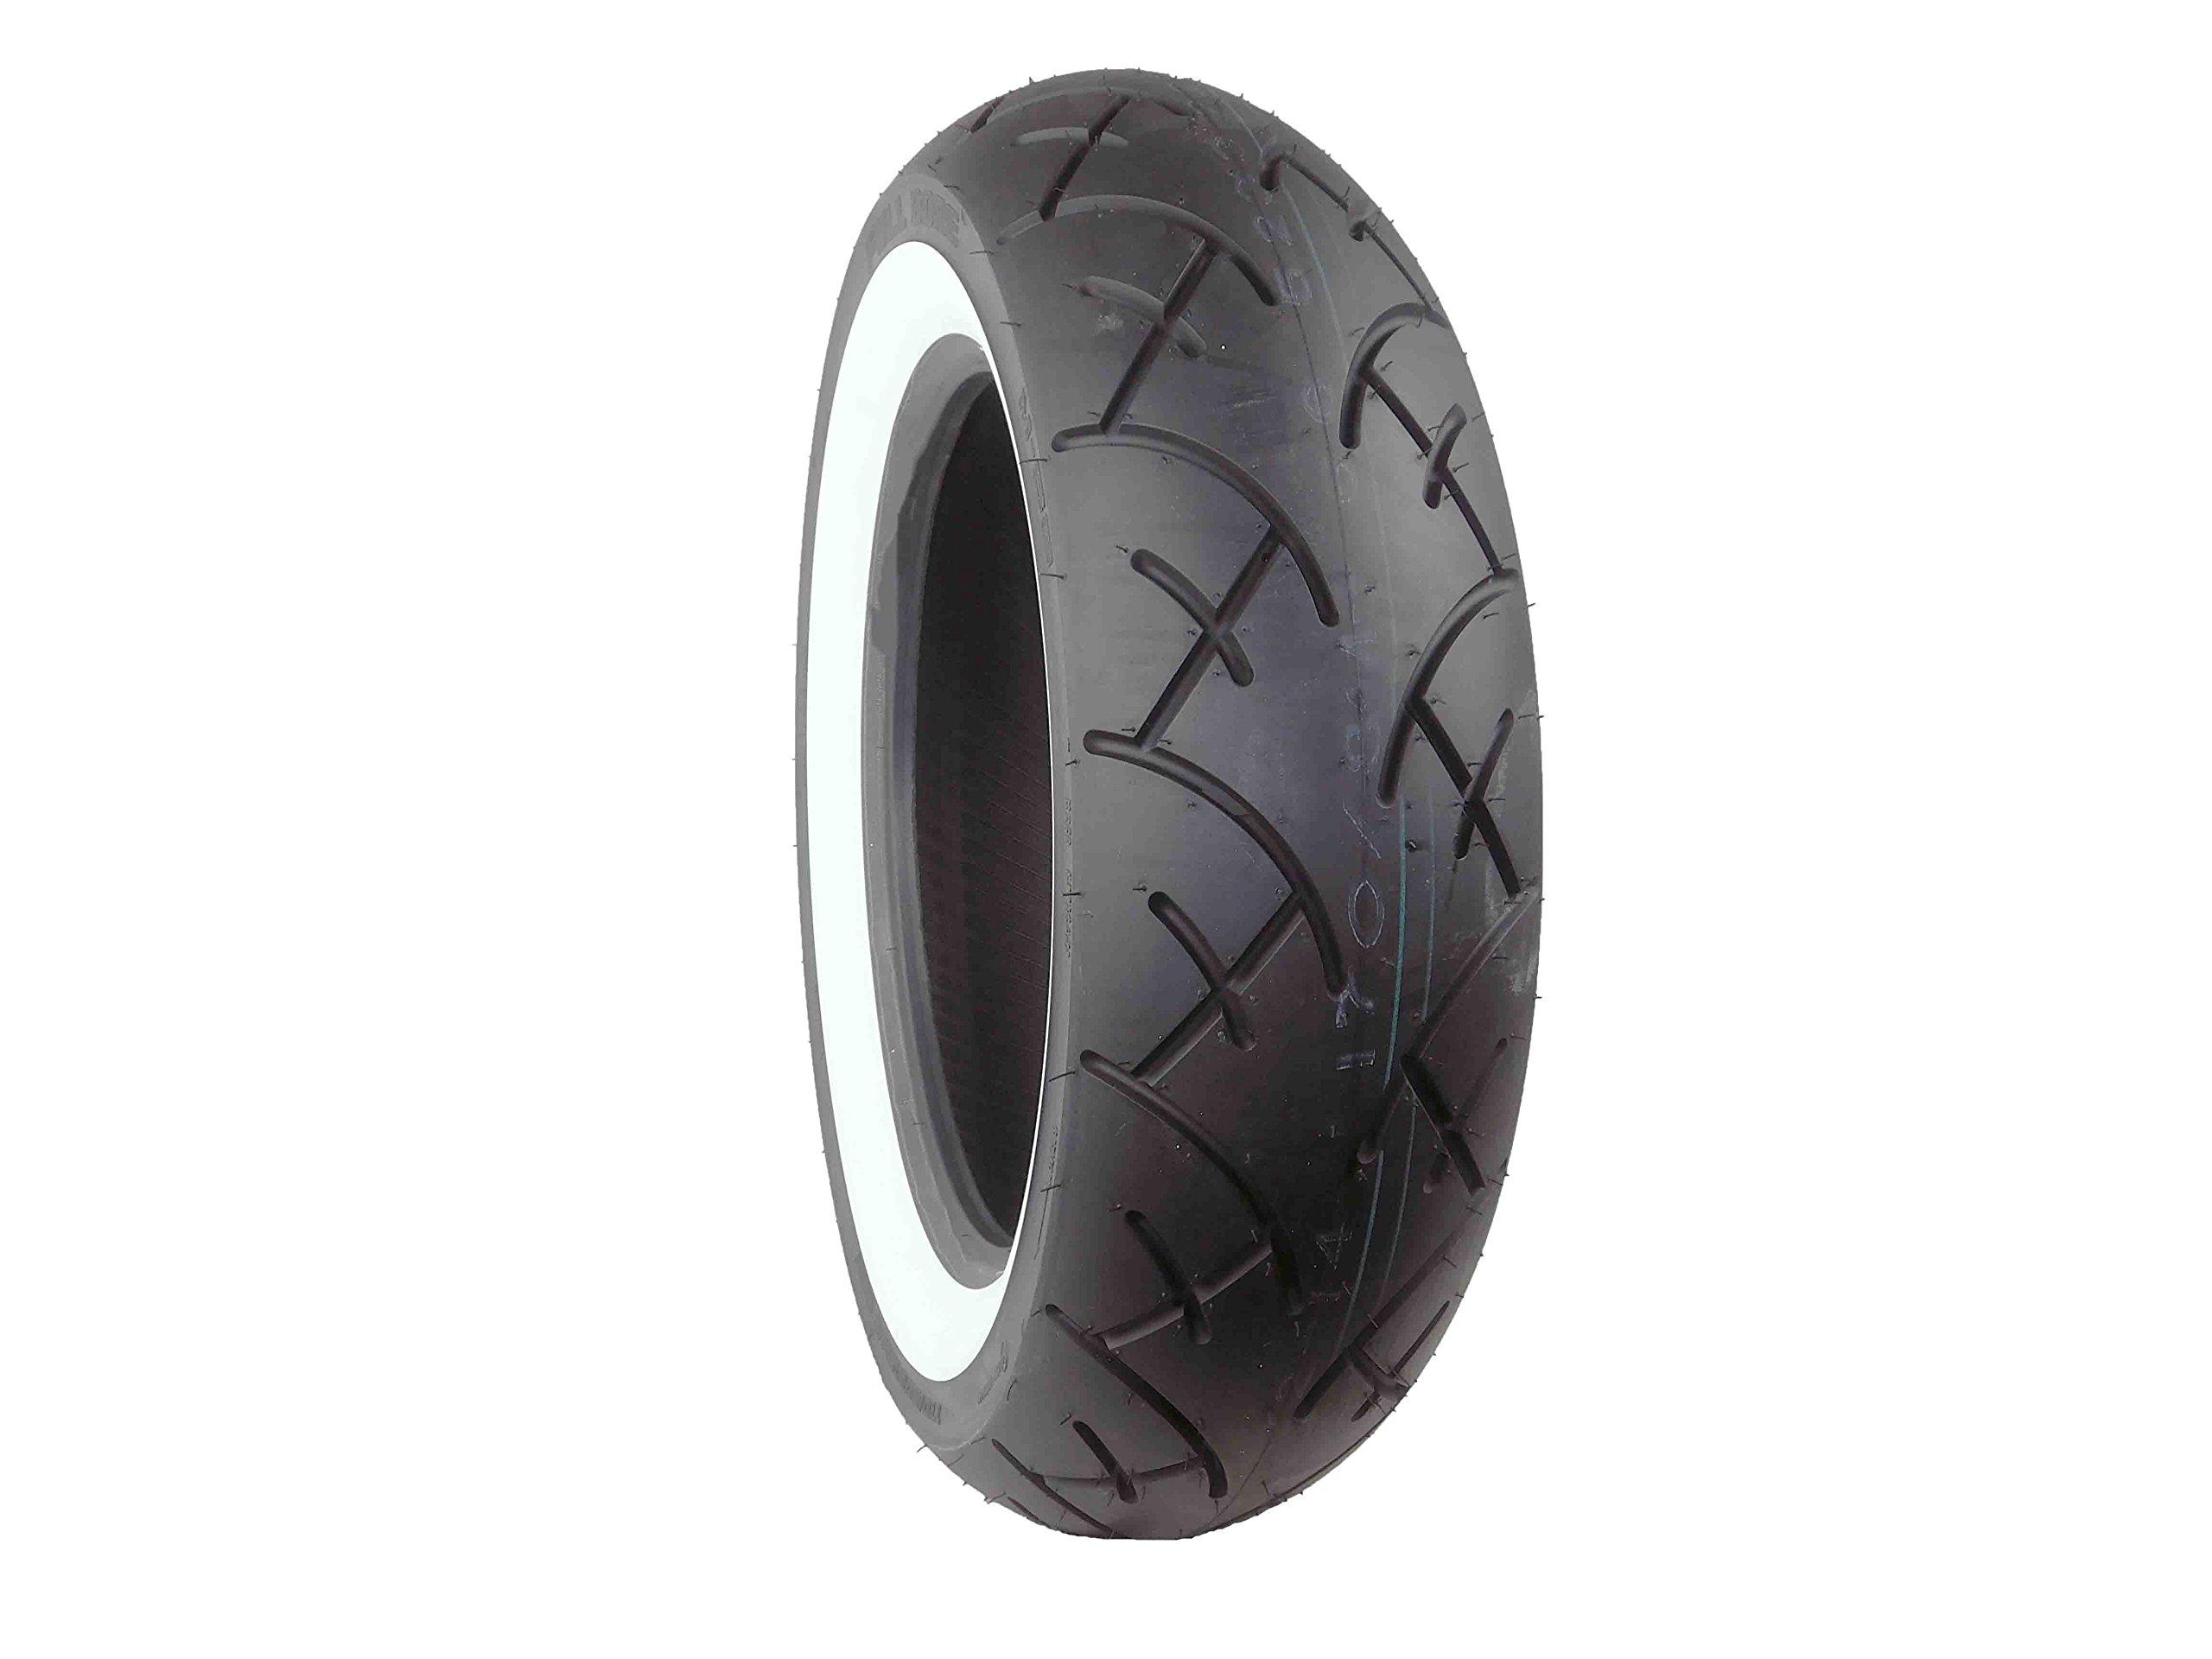 Full Bore M-66 Tour King Cruiser Motorcycle Tire (170/80B15)